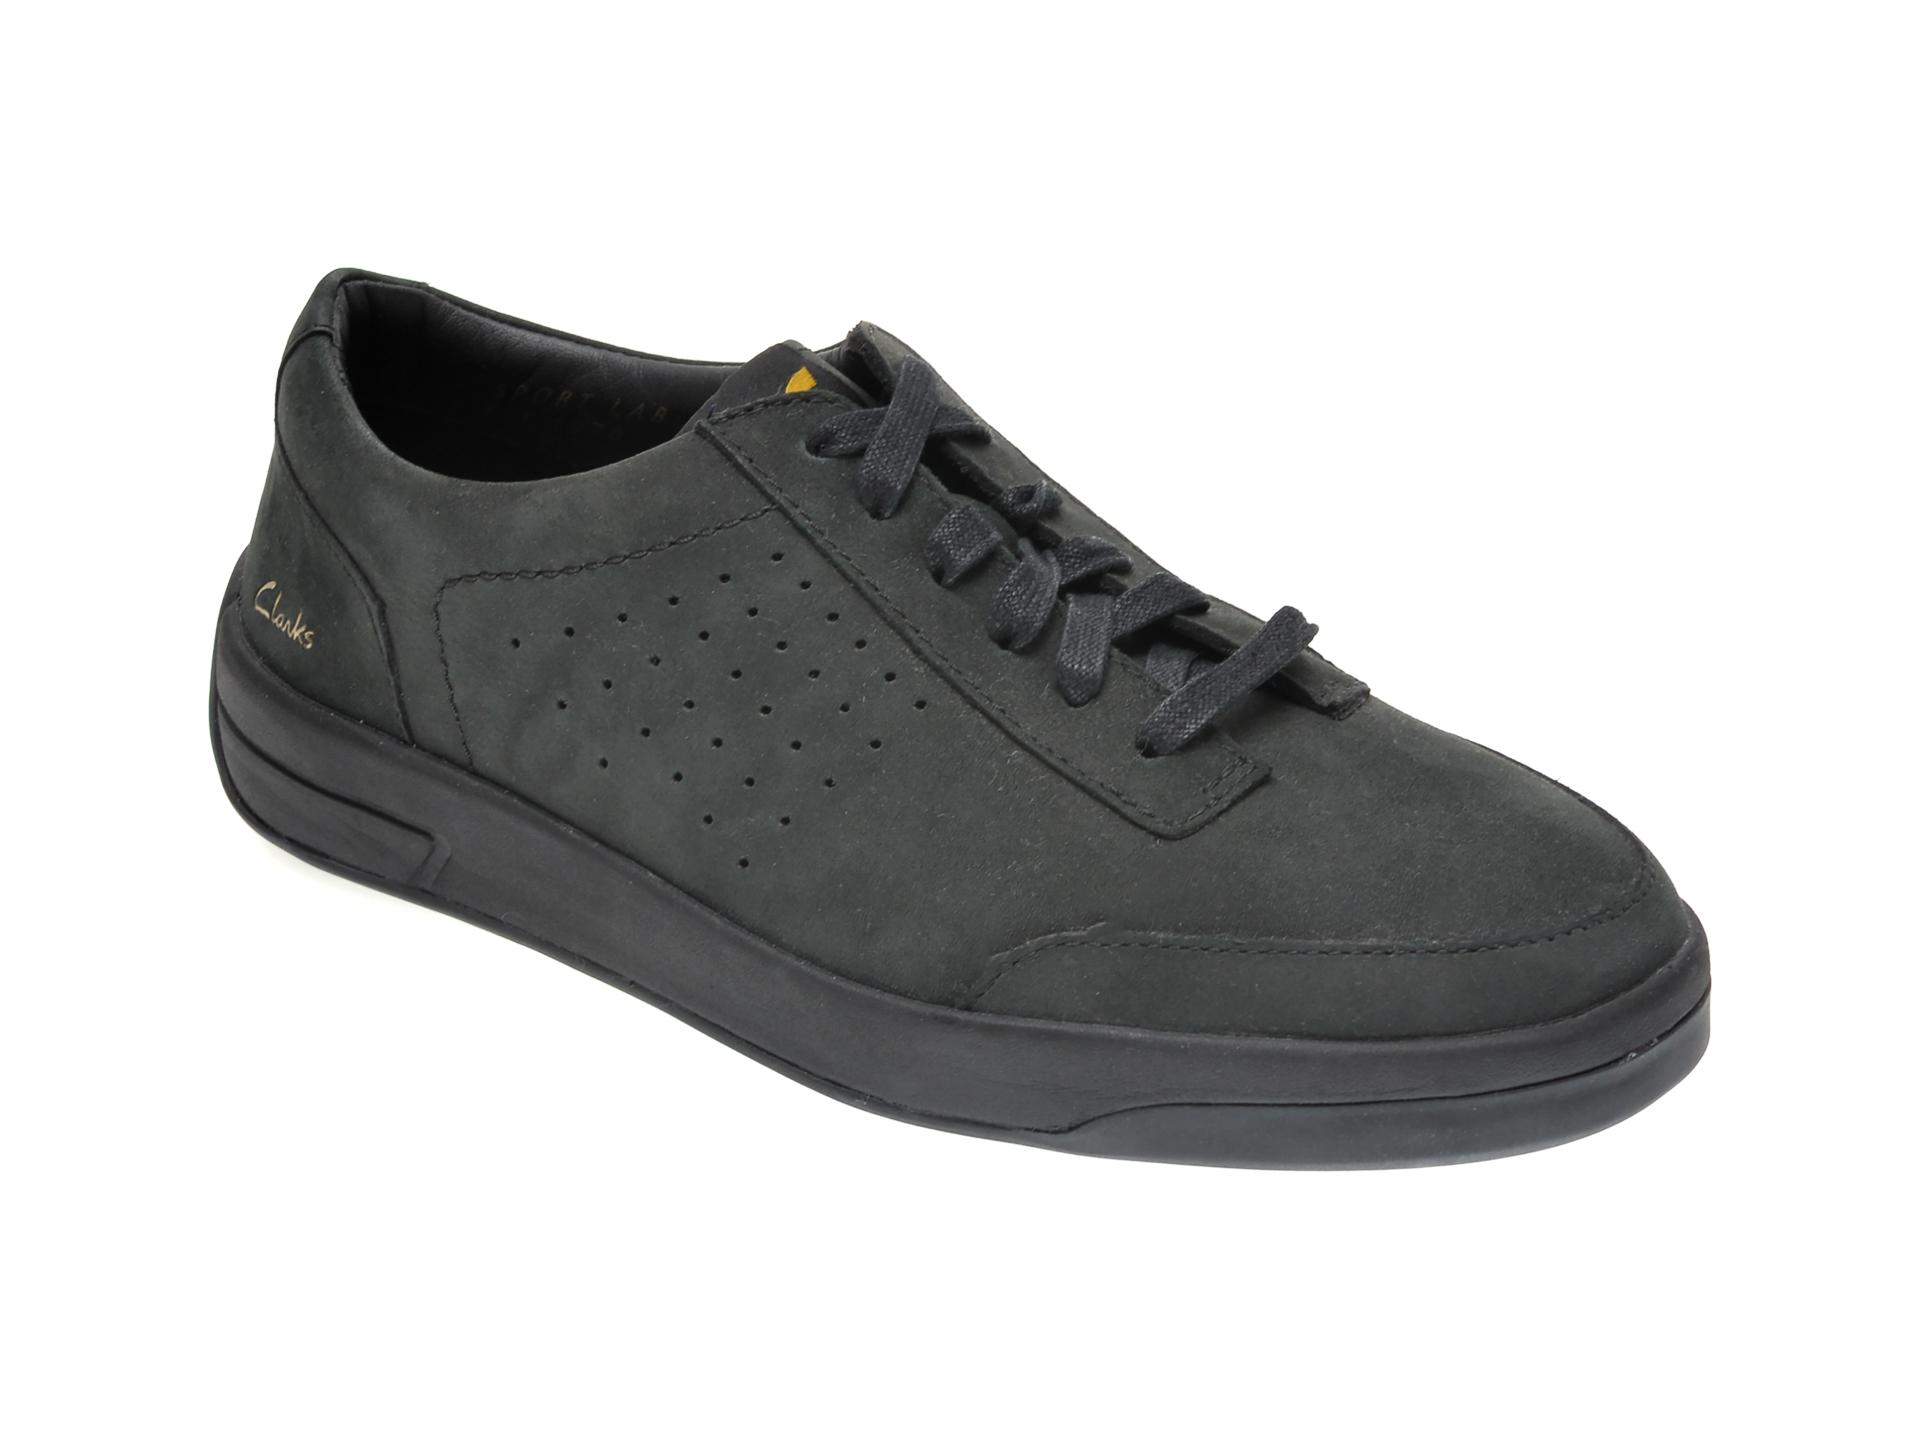 Pantofi CLARKS negri, HERO AIR LACE, din nabuc imagine